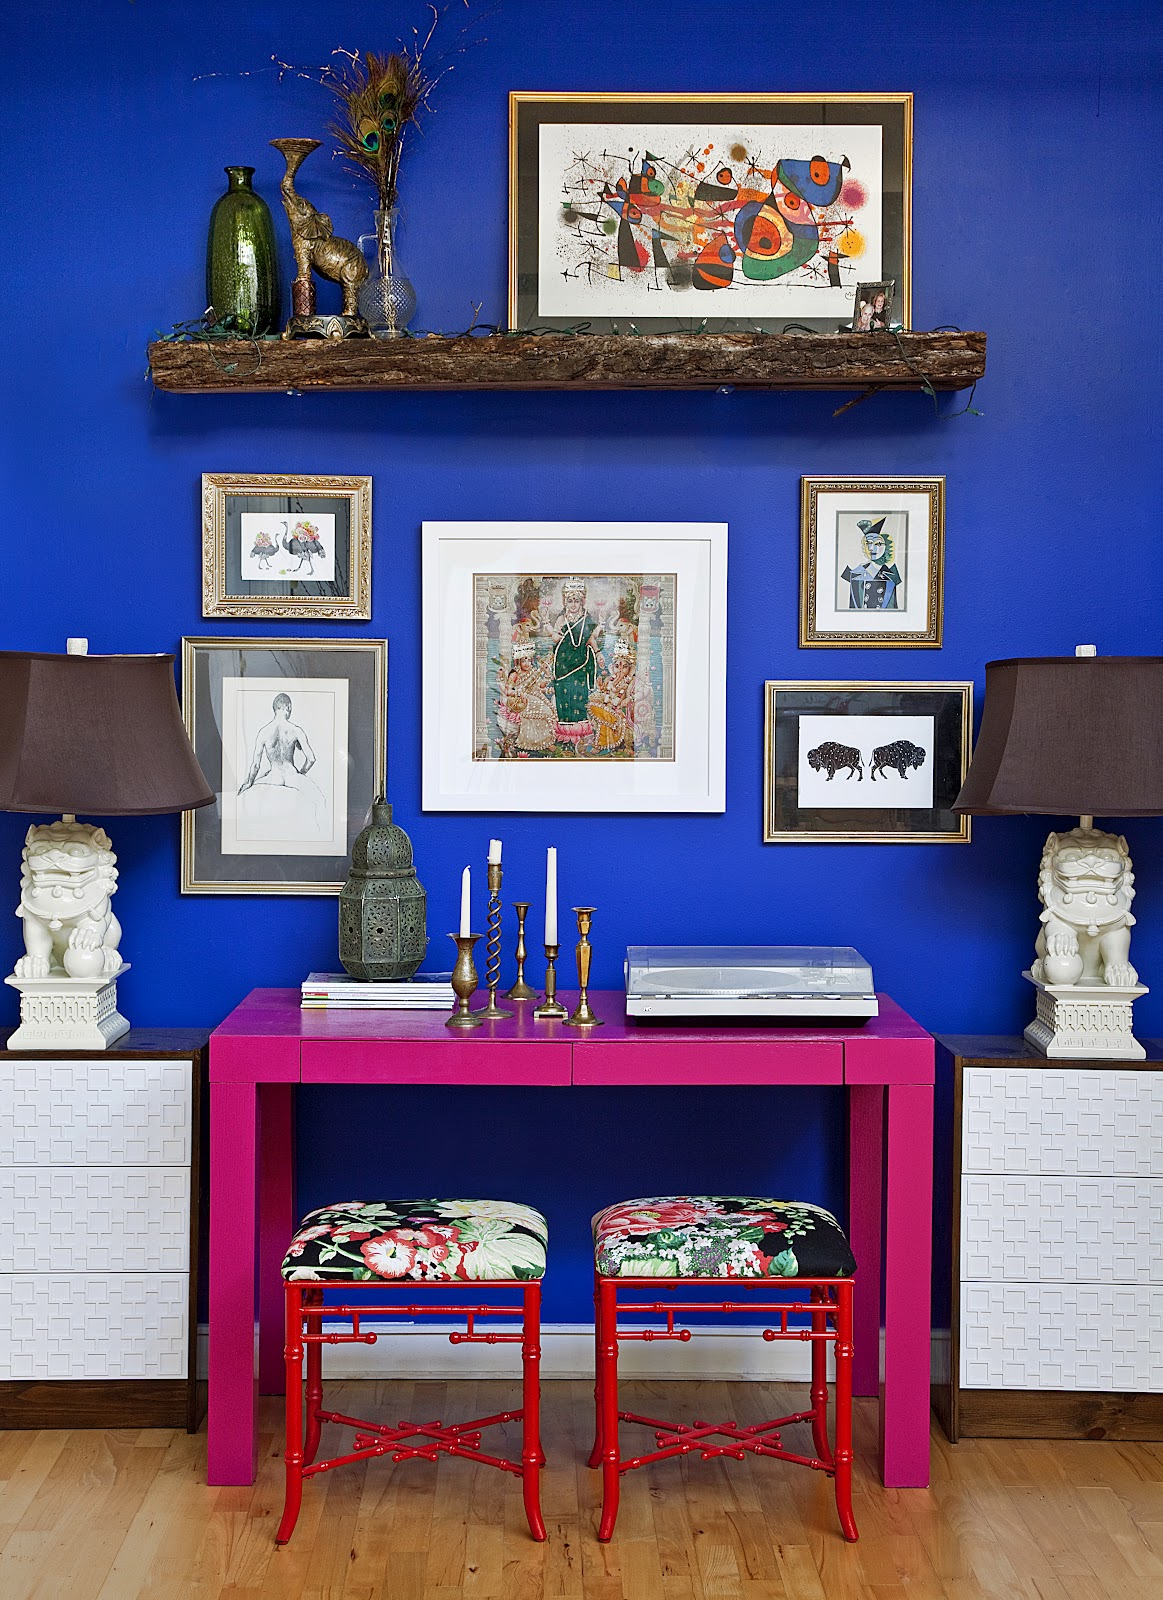 http://2.bp.blogspot.com/-FSNhBLP-hc0/T8UuaItoArI/AAAAAAAASVk/H-_8m3nTbeo/s1600/blue+wall+pink+parsons+desk+ikea+rast+cabinet+foo+dog+lamp+design+manifest.jpg